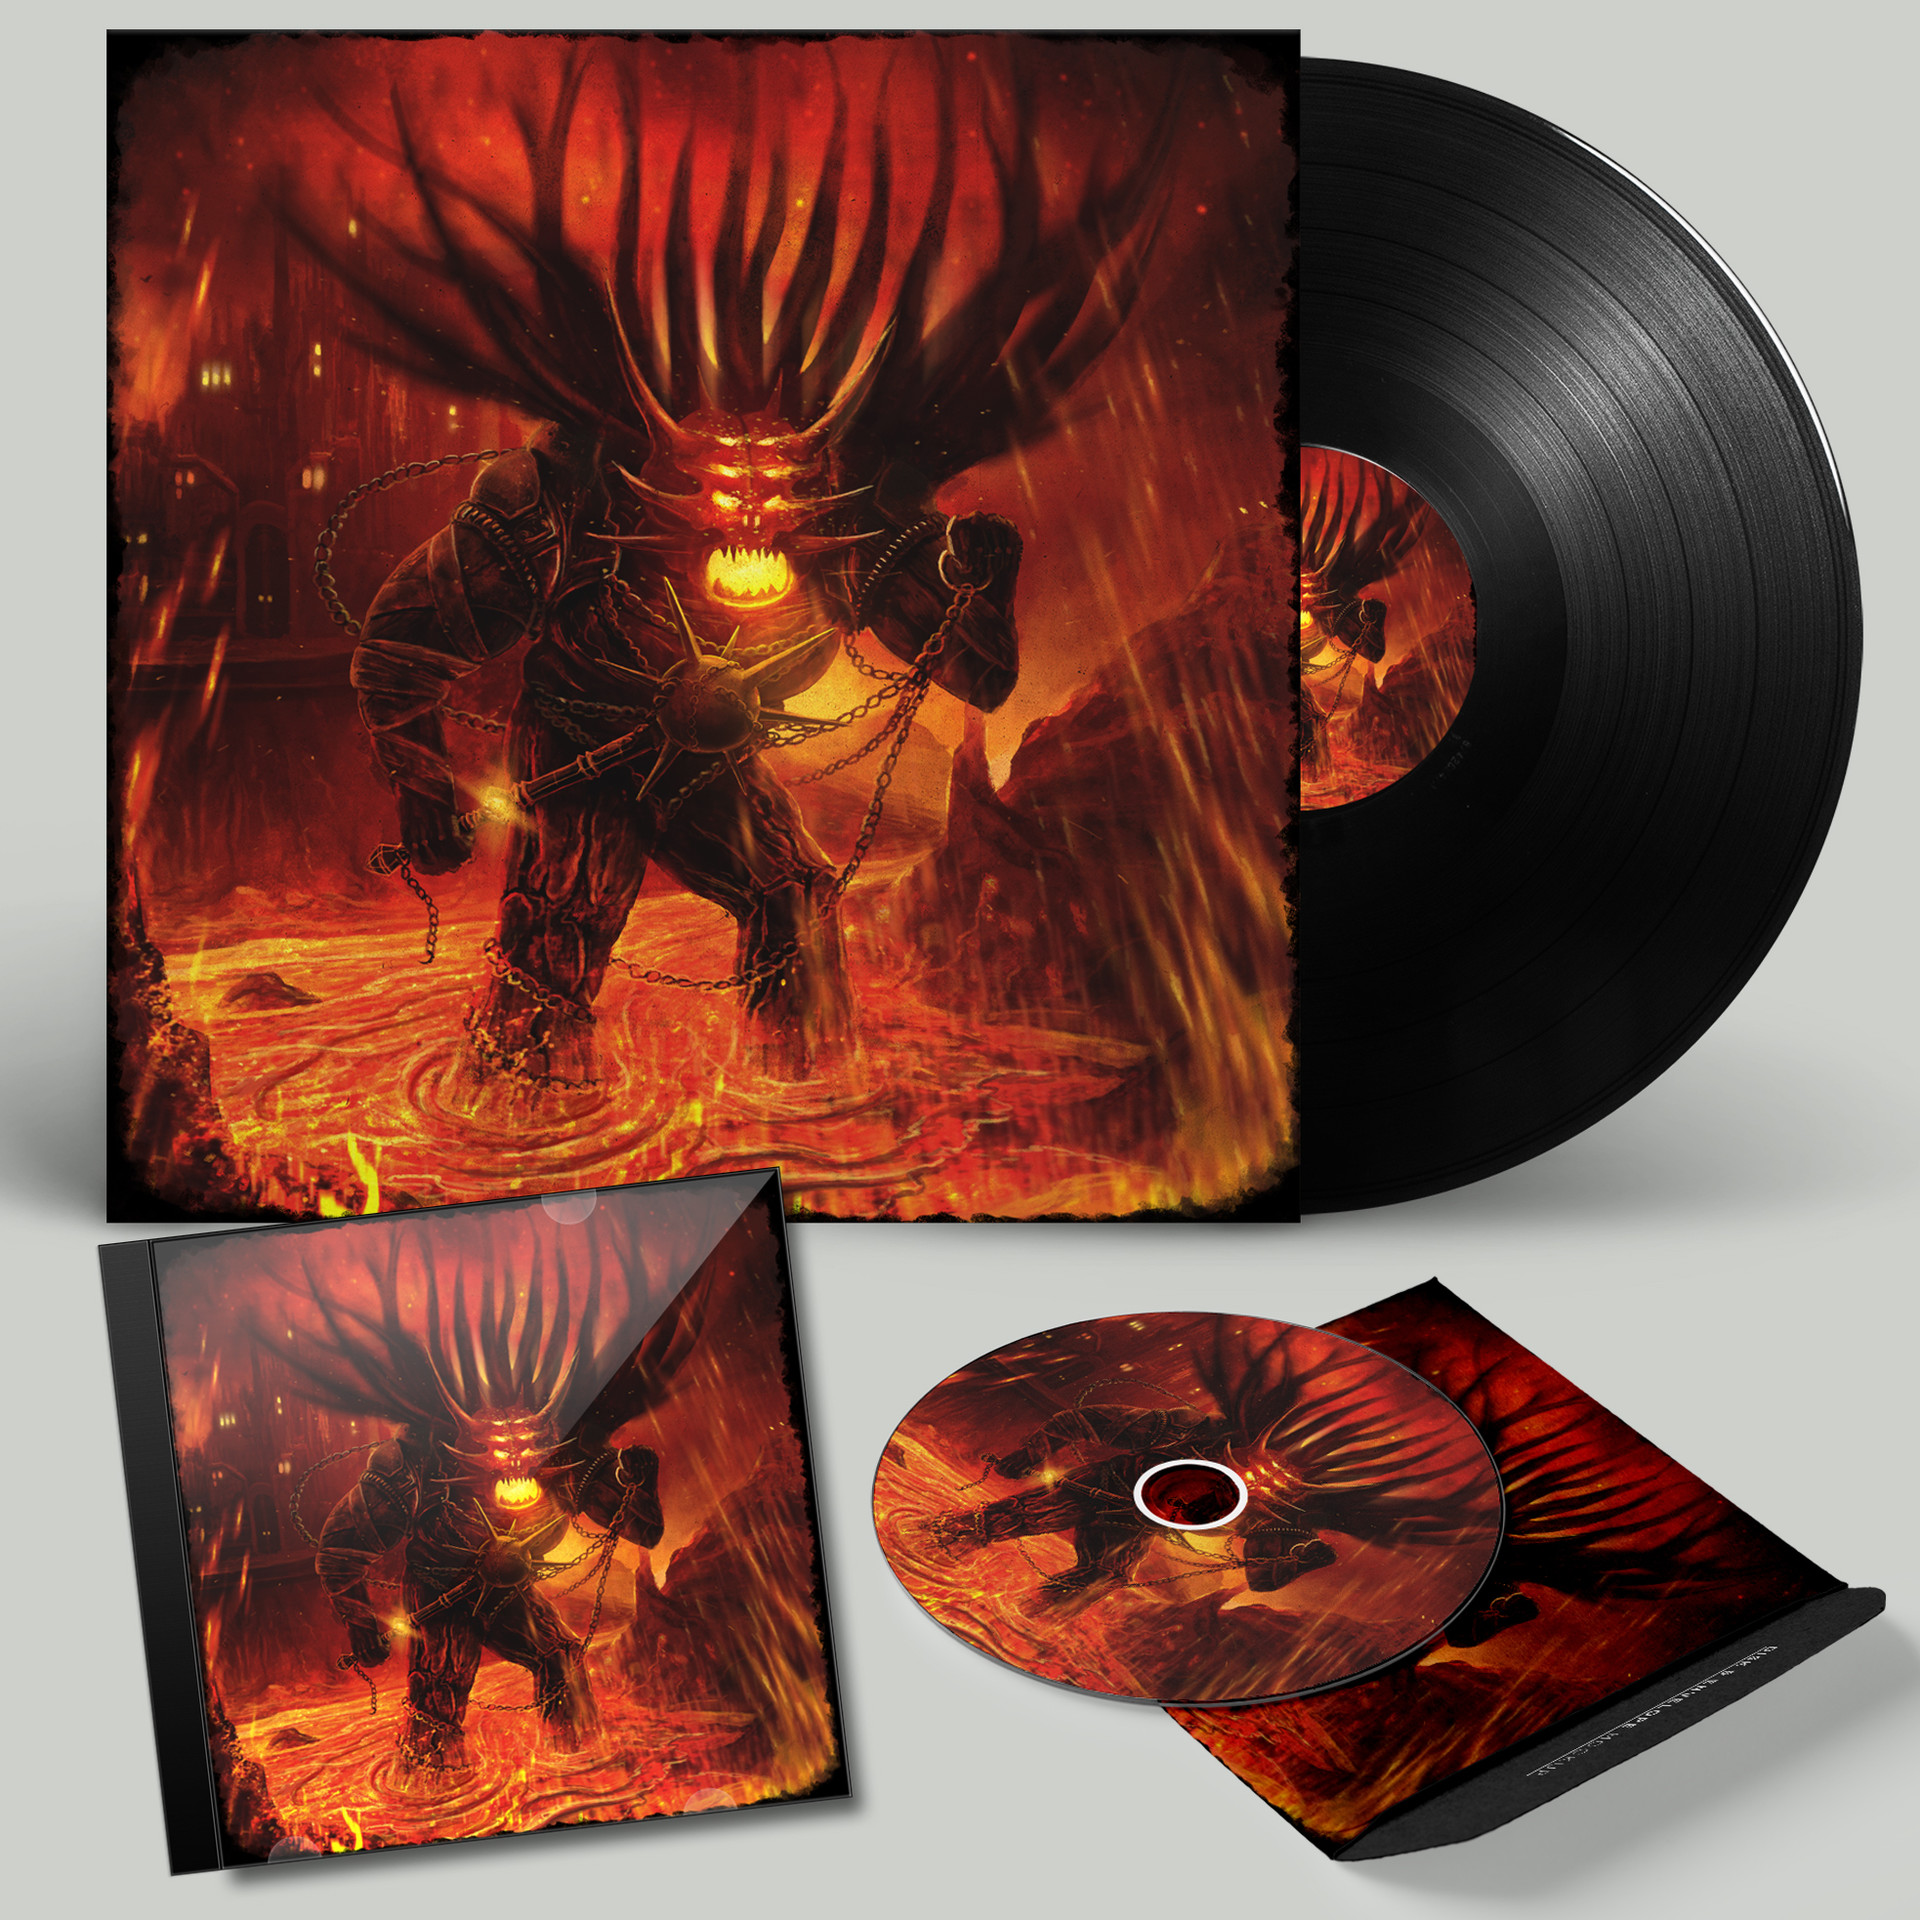 Anton karlik vinyl record psd mockup